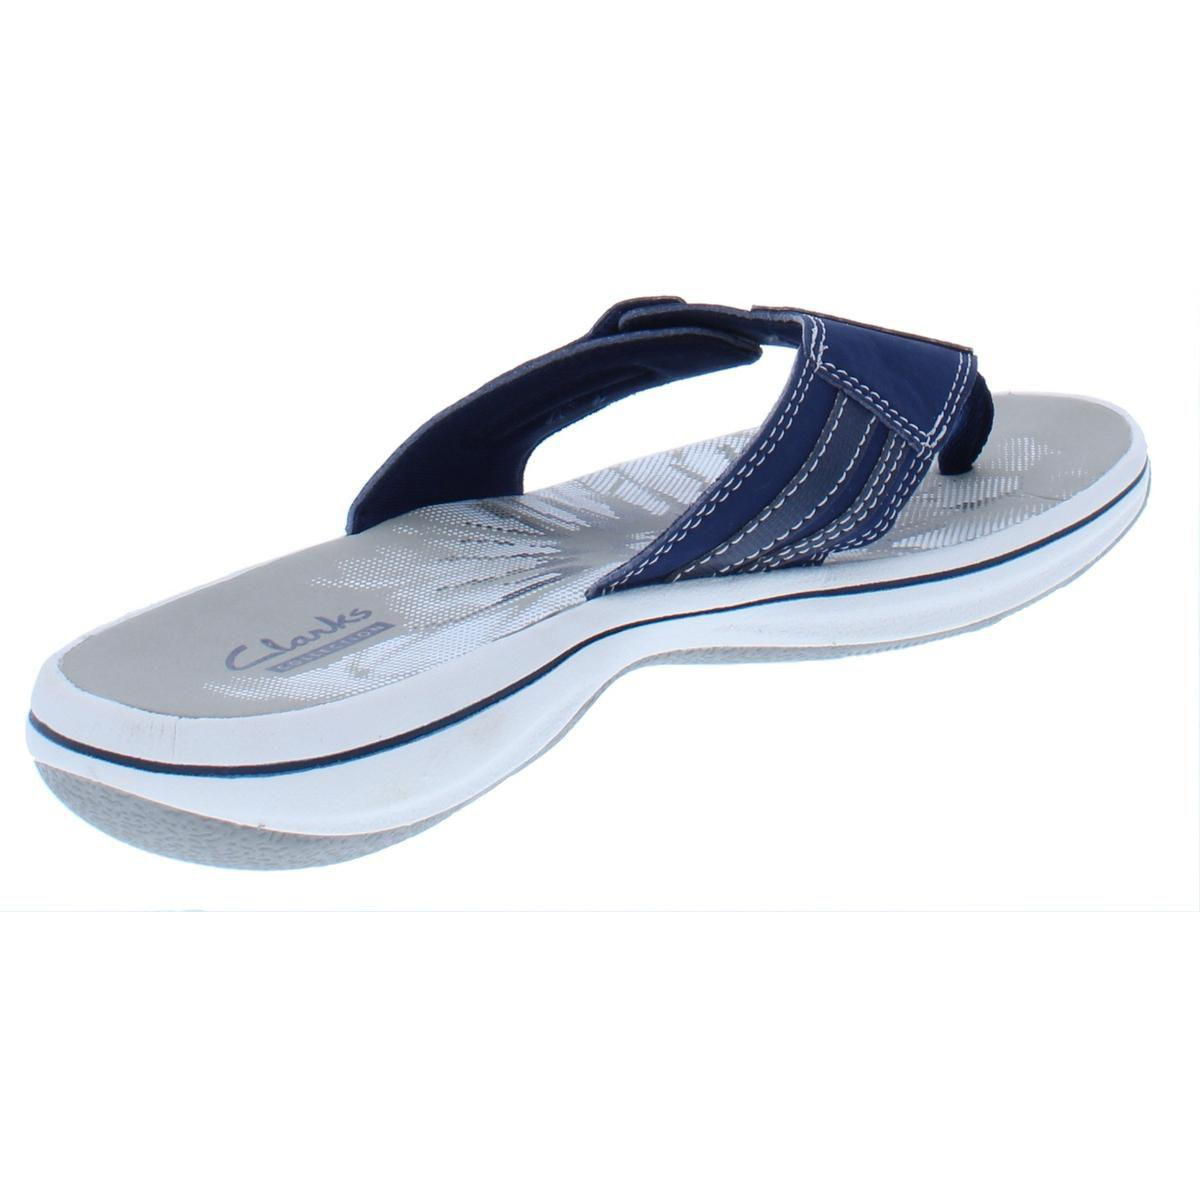 906b9fca045 Lyst - Clarks Womens Brinkley Jojo Casual Summer Sport Sandals in Blue